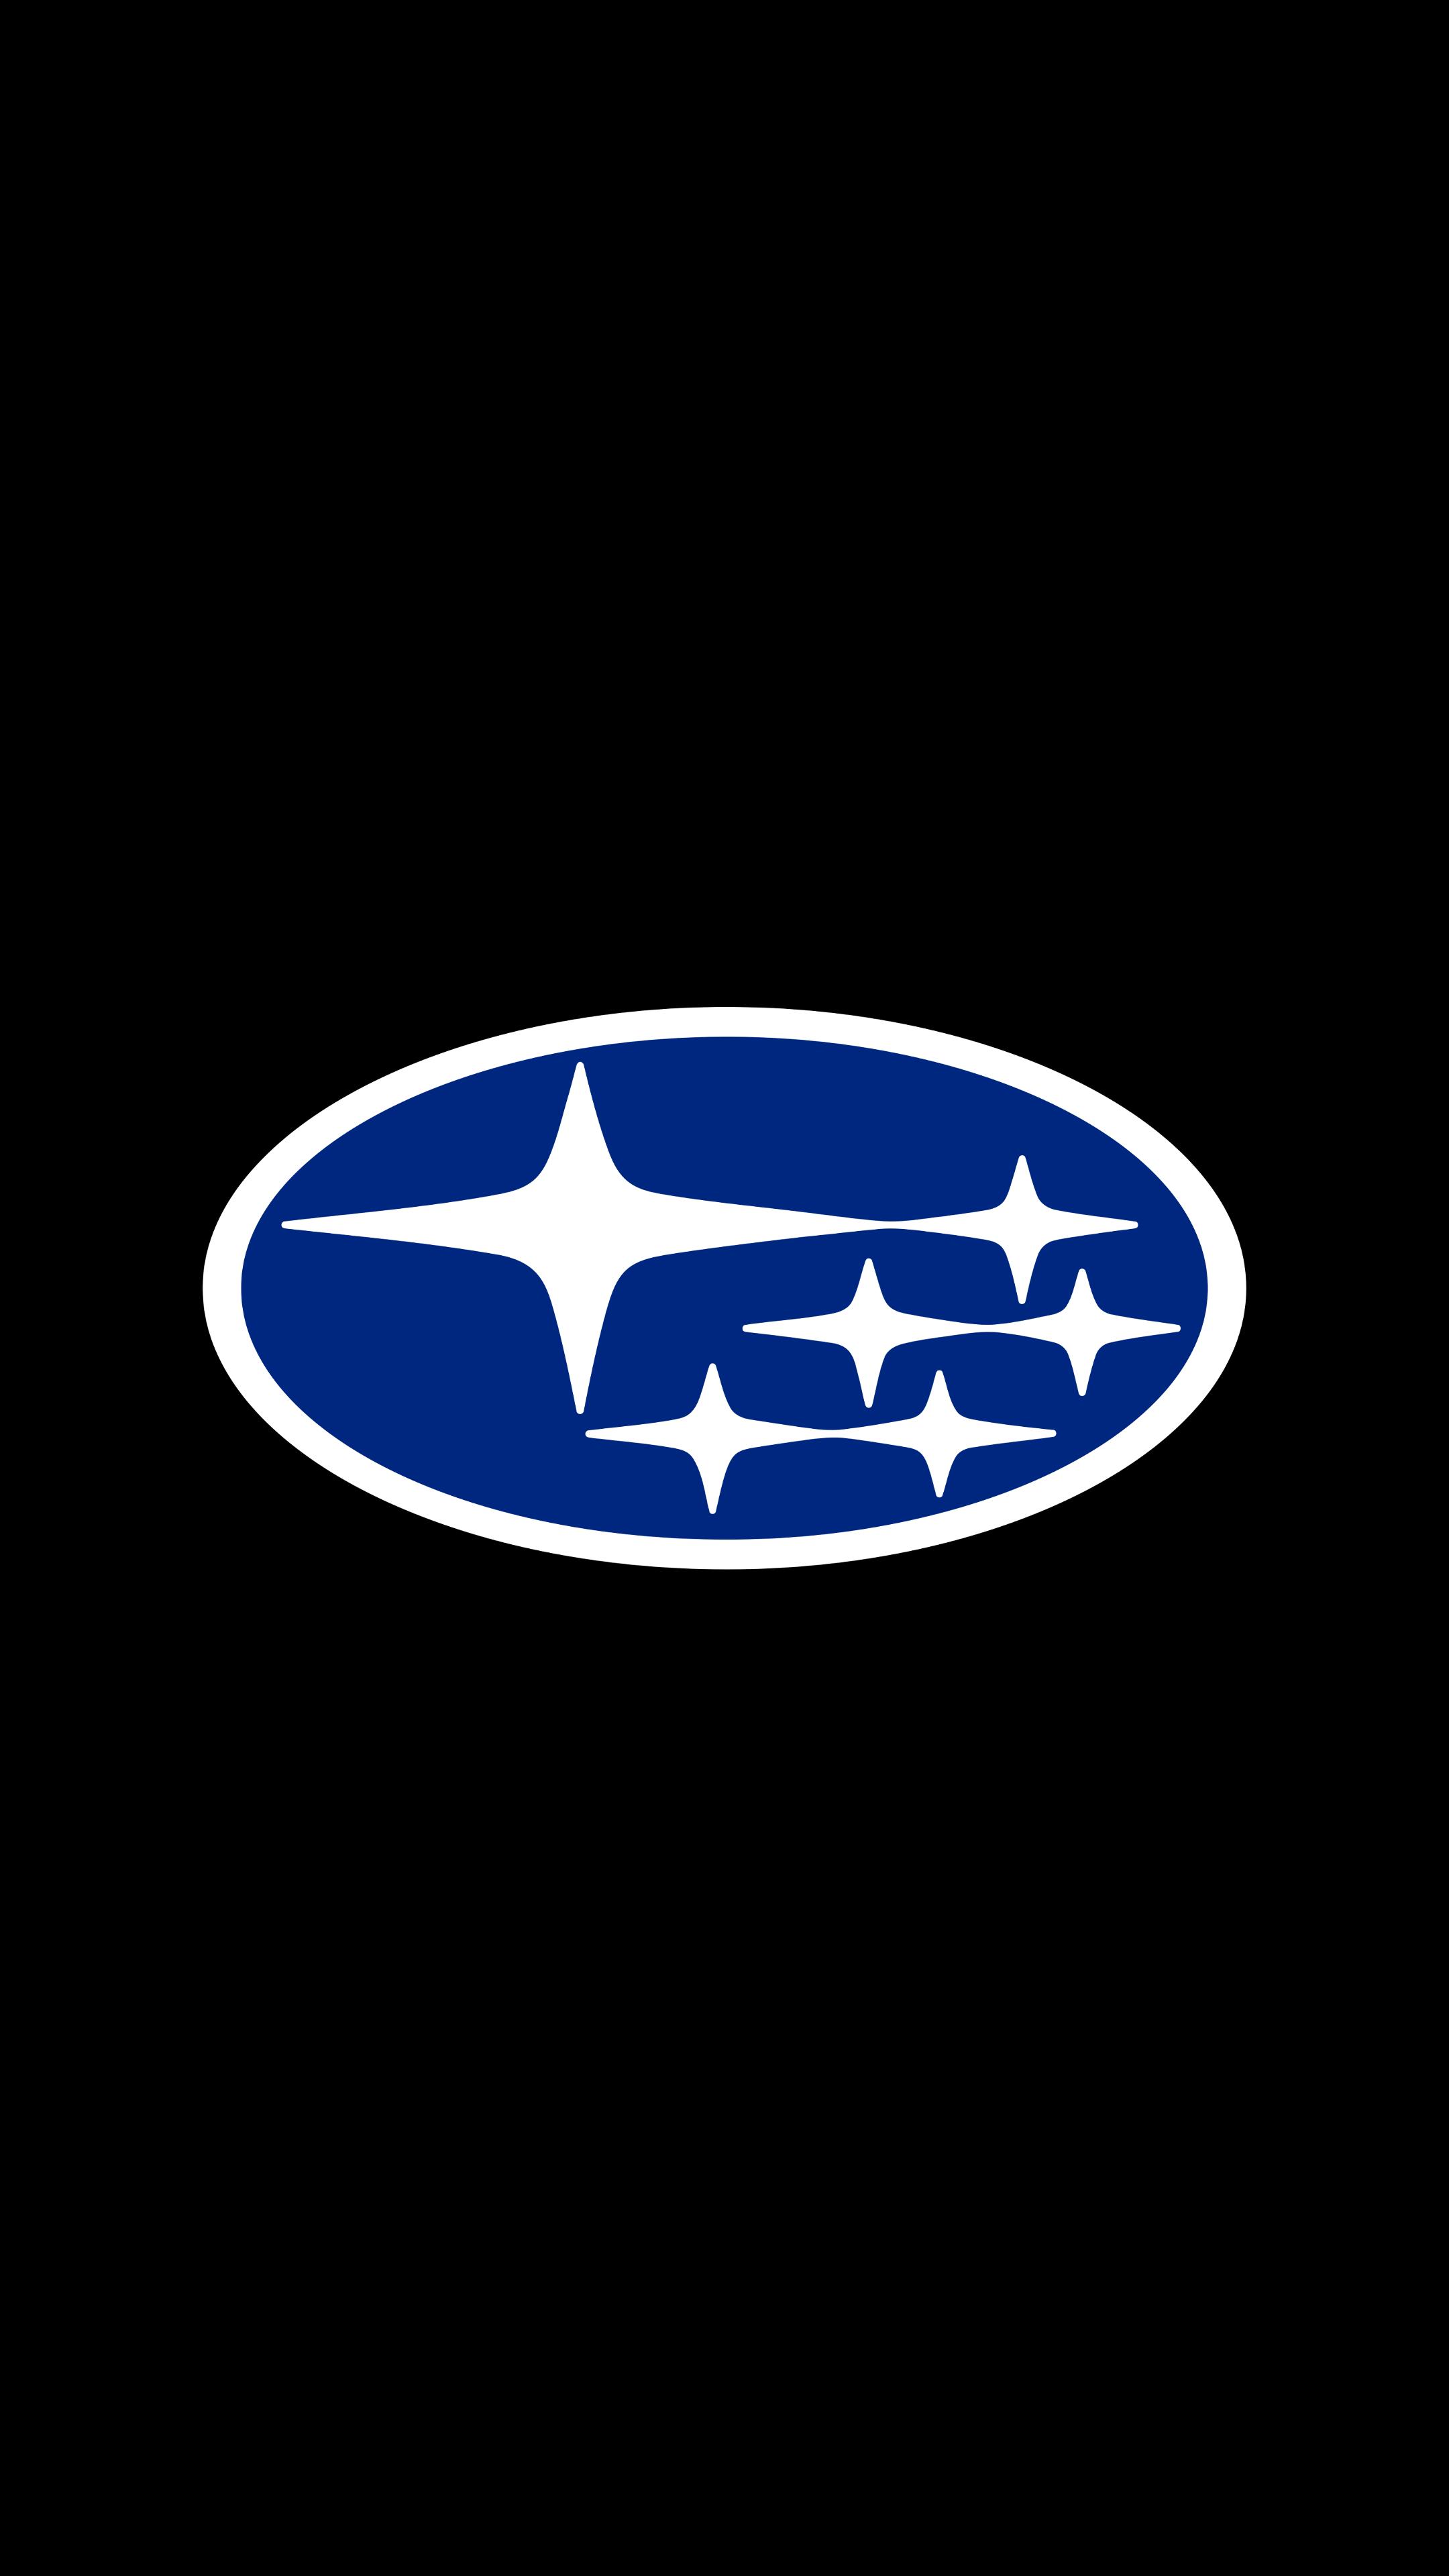 Cars Subaru Wallpapers image by Wallpaper Subaru